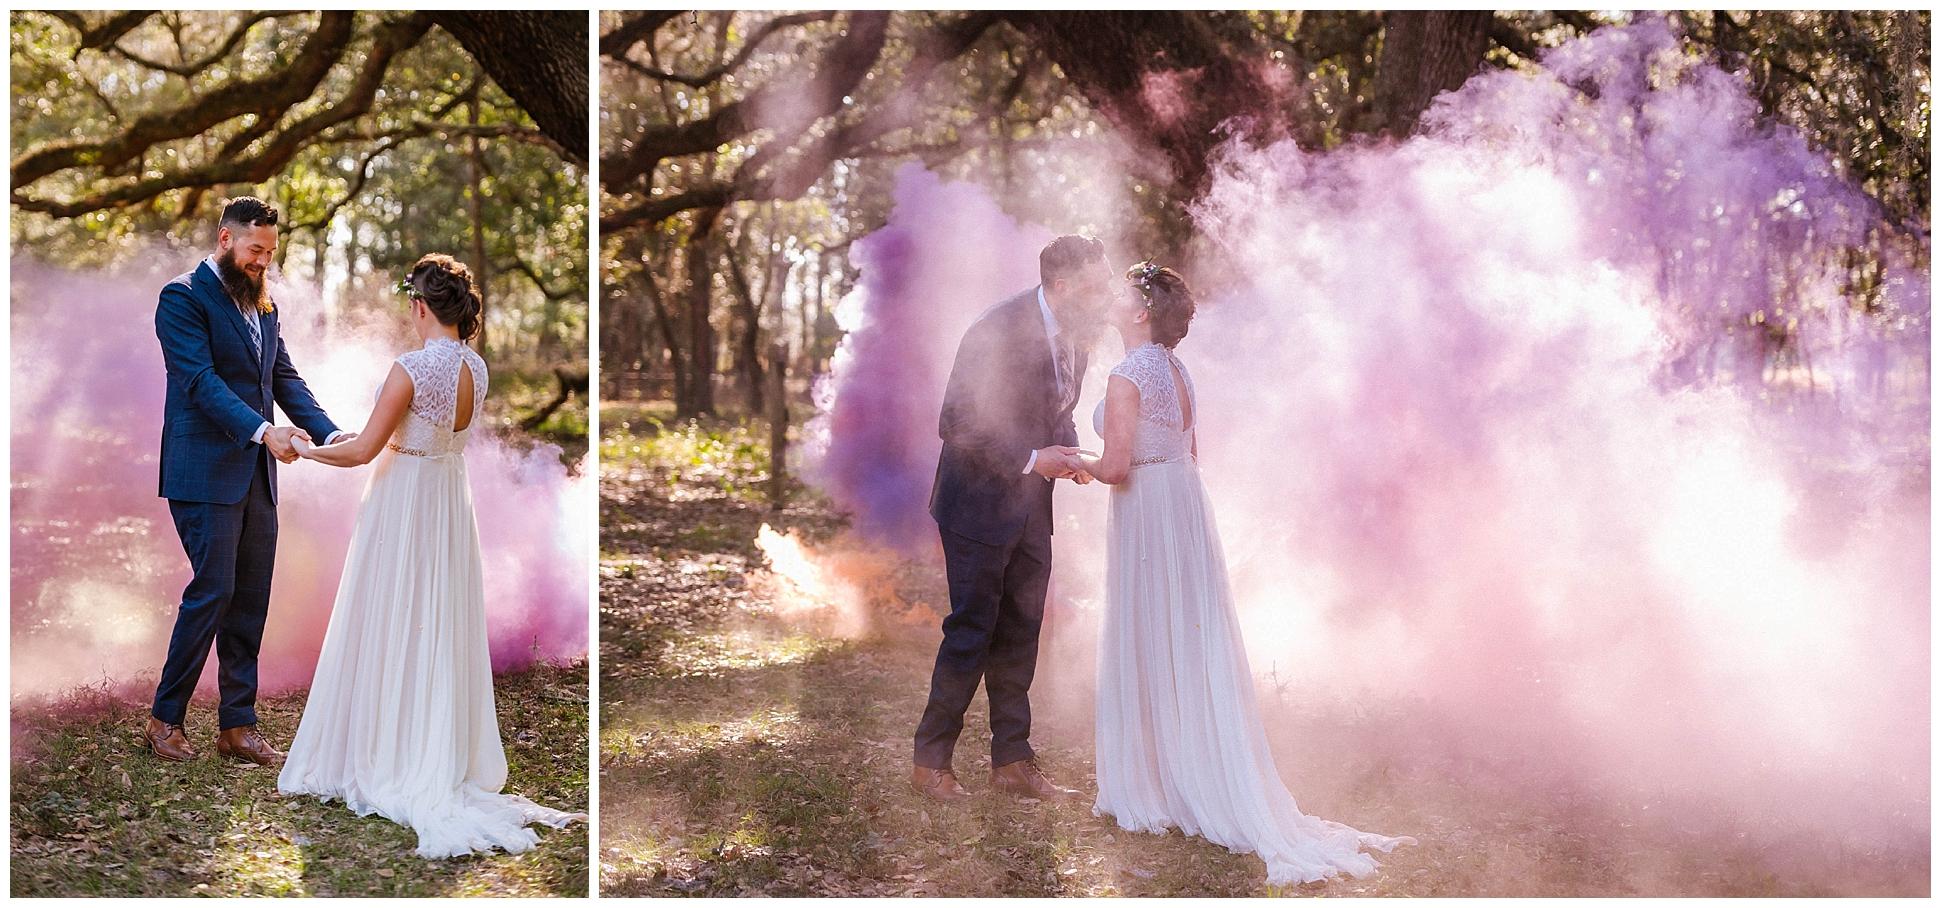 magical-outdoor-florida-wedding-smoke-bombs-flowers-crown-beard_0014.jpg